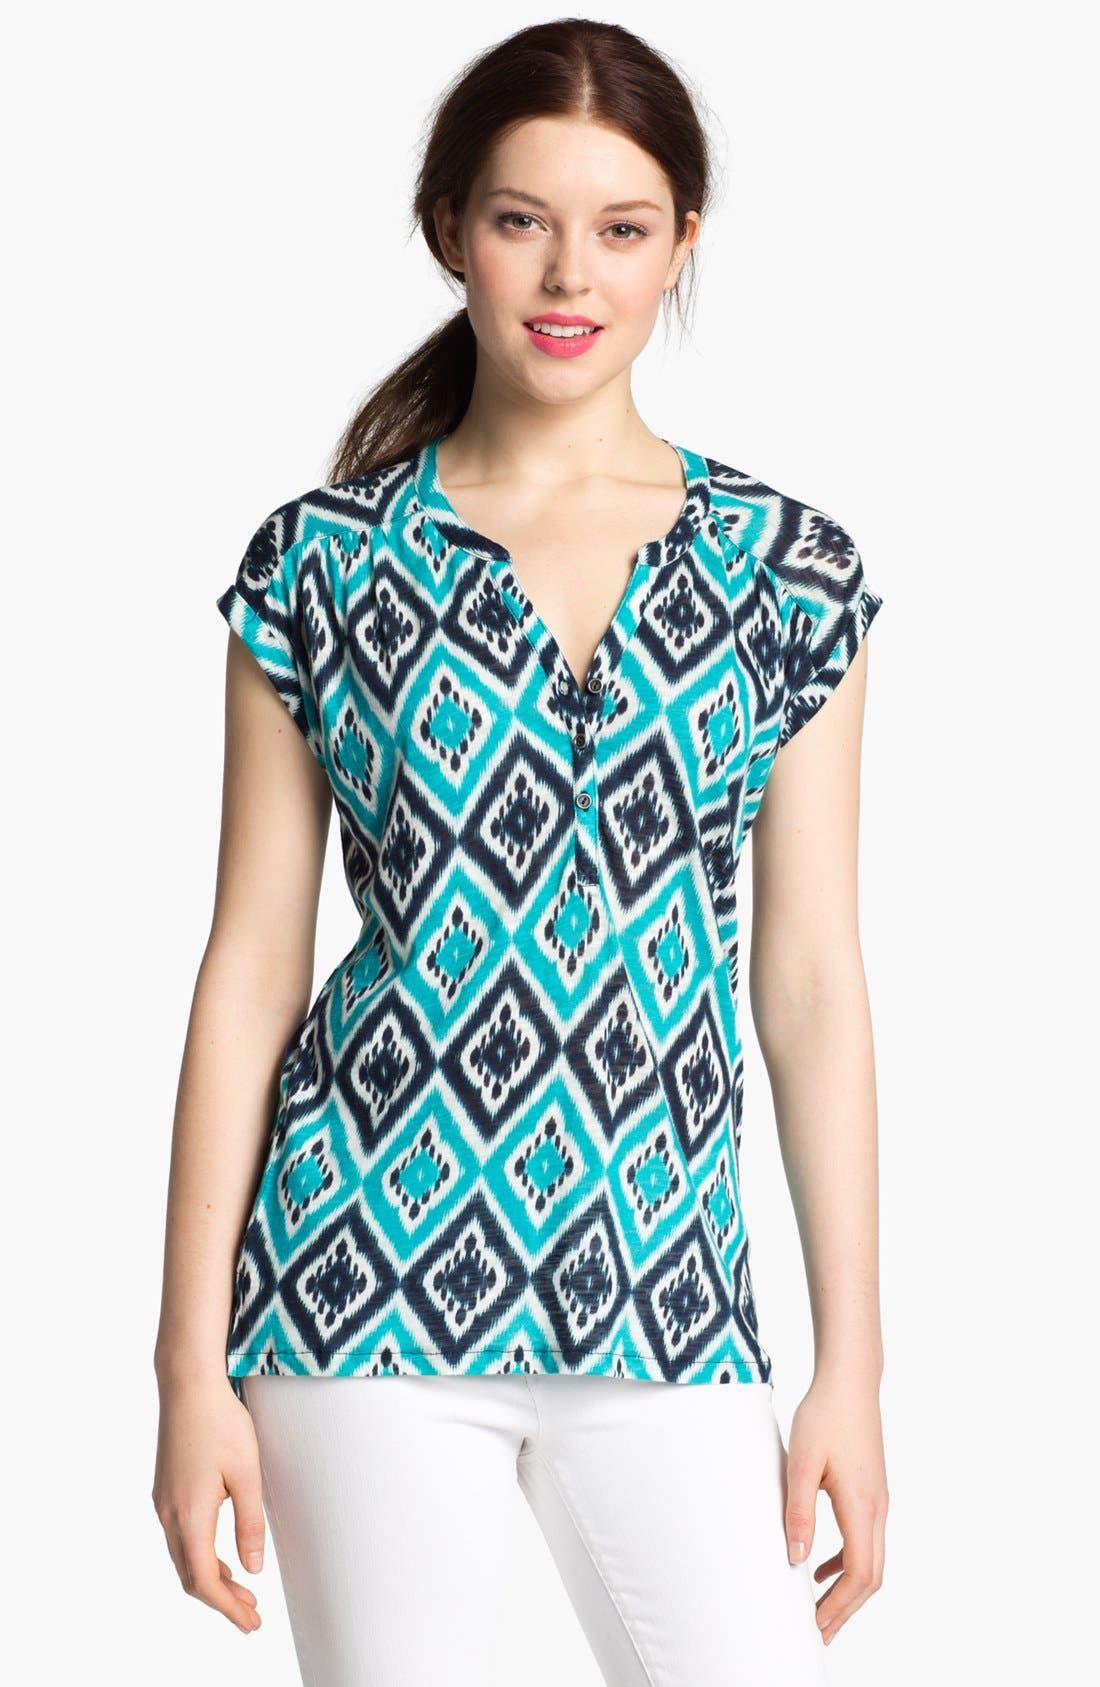 Alternate Image 1 Selected - Lucky Brand 'Ikat Diamond' Cotton Top